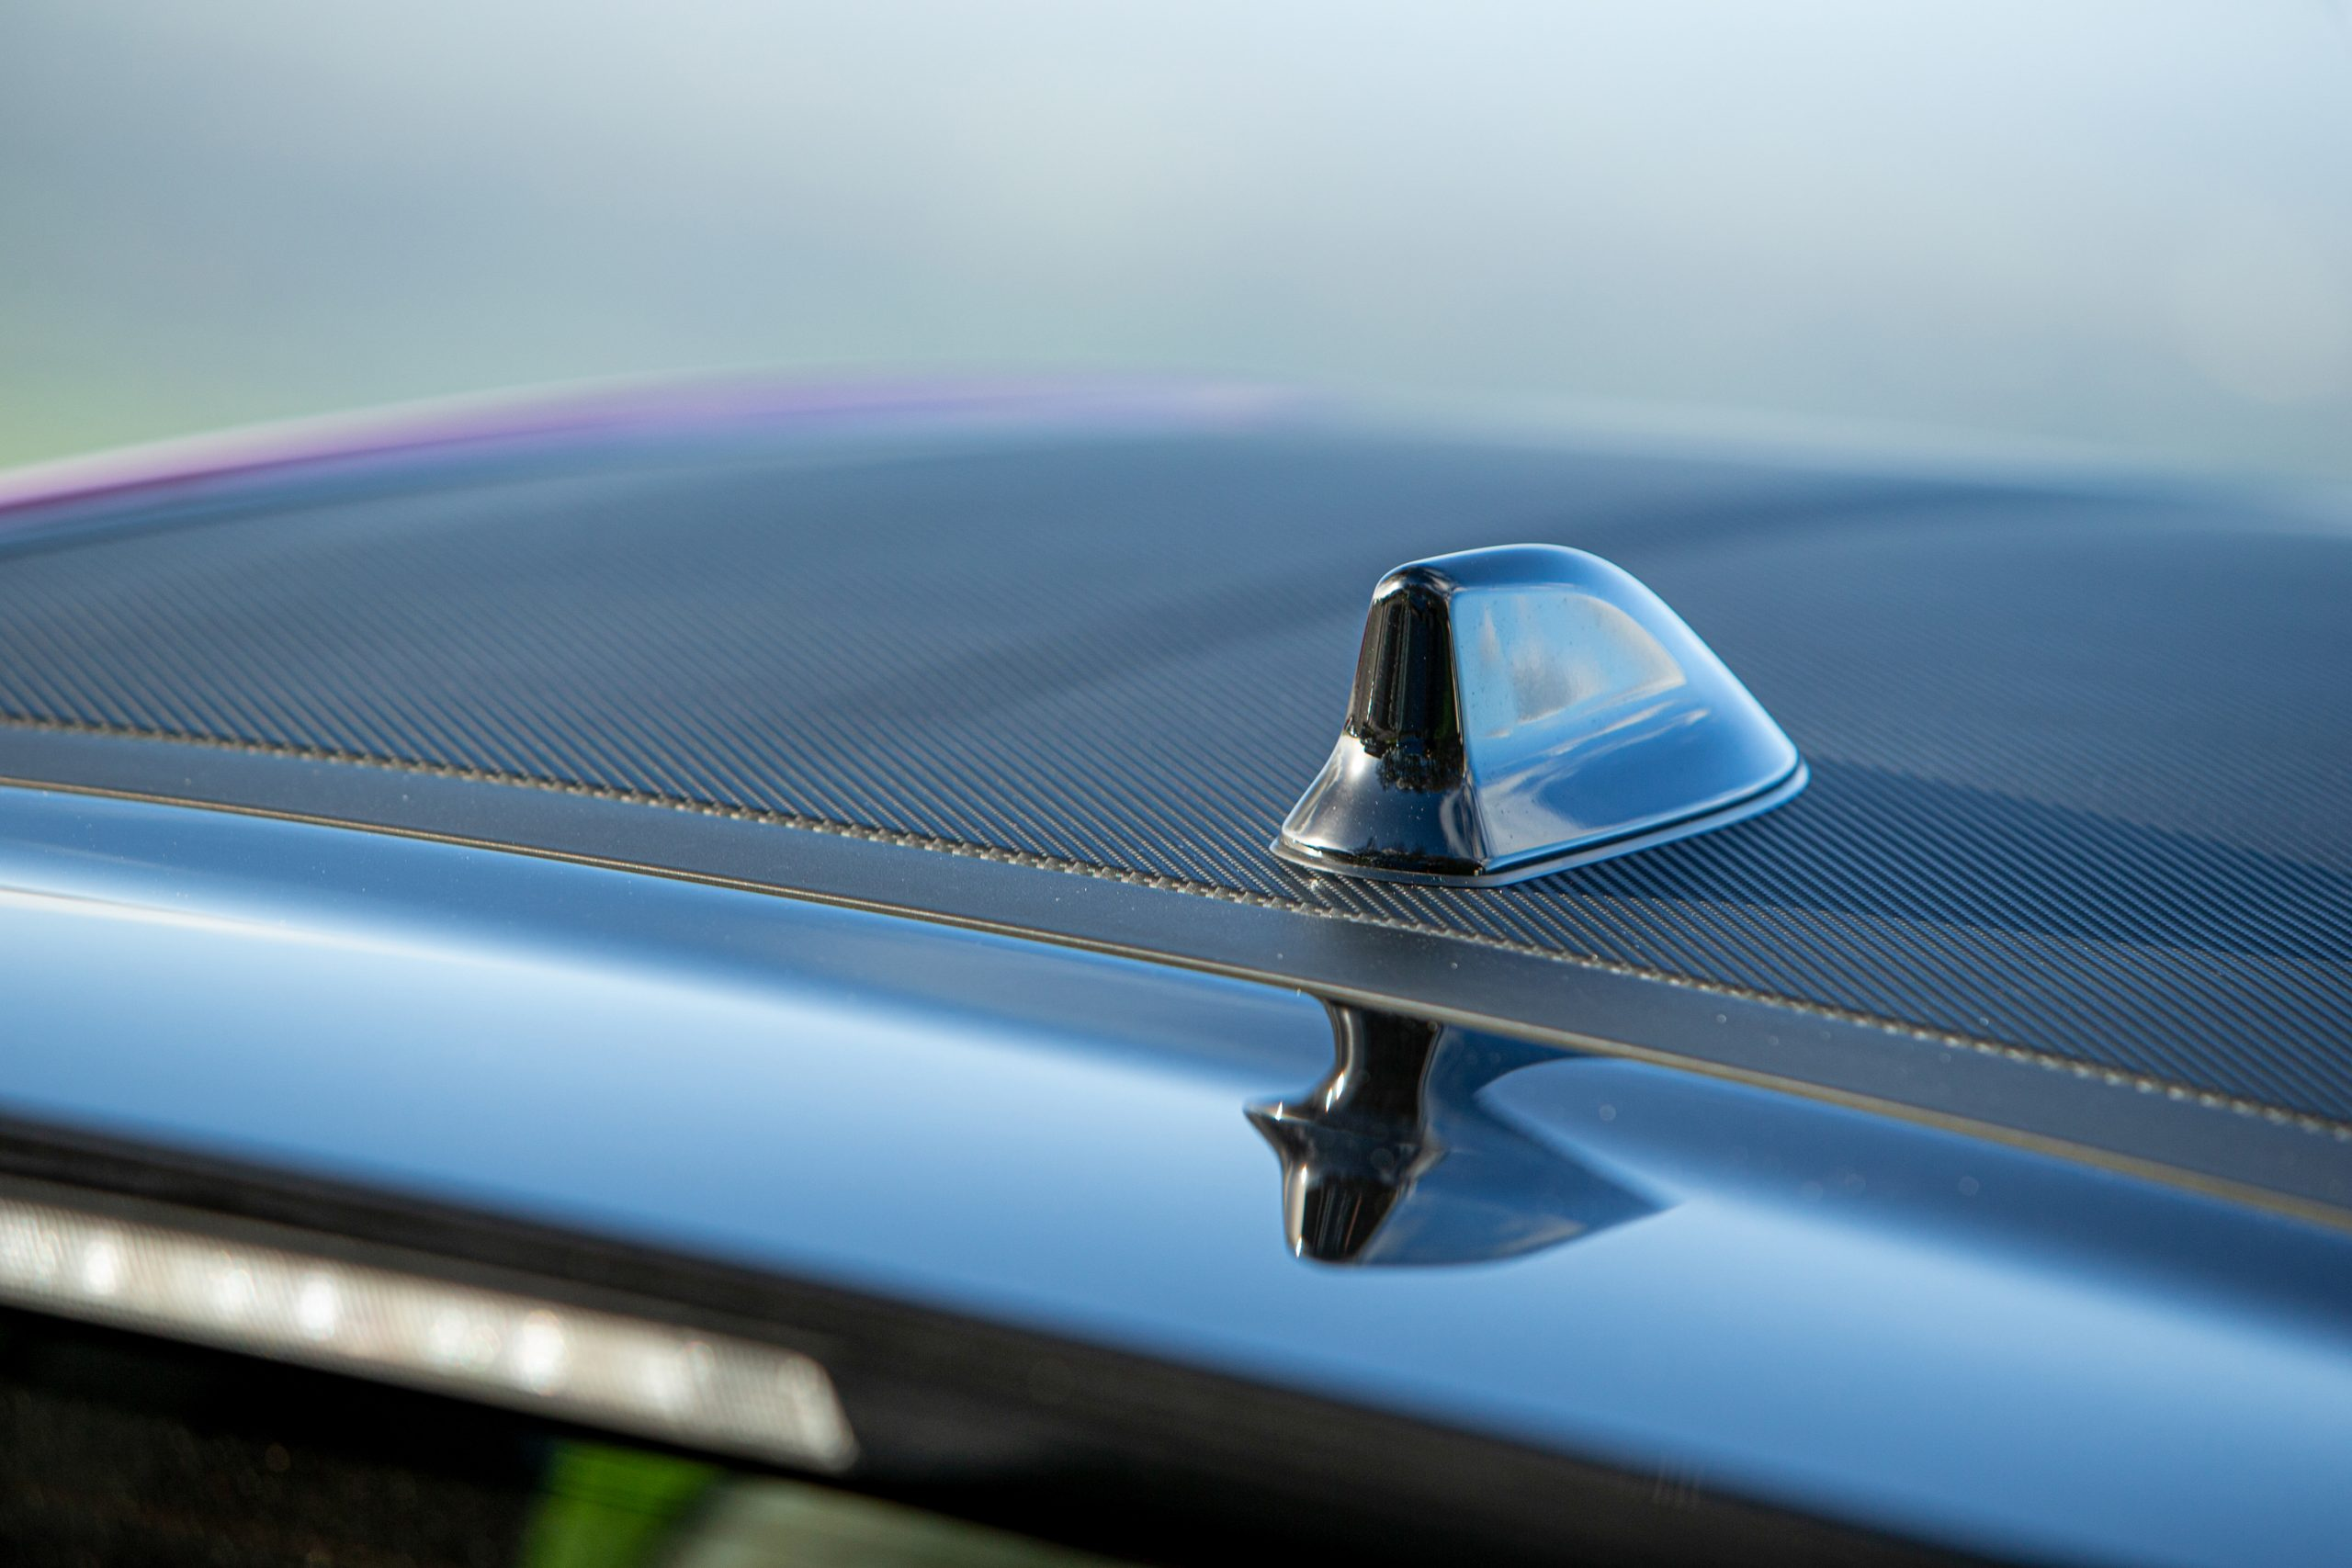 GR Toyota Yaris fin antenna detail